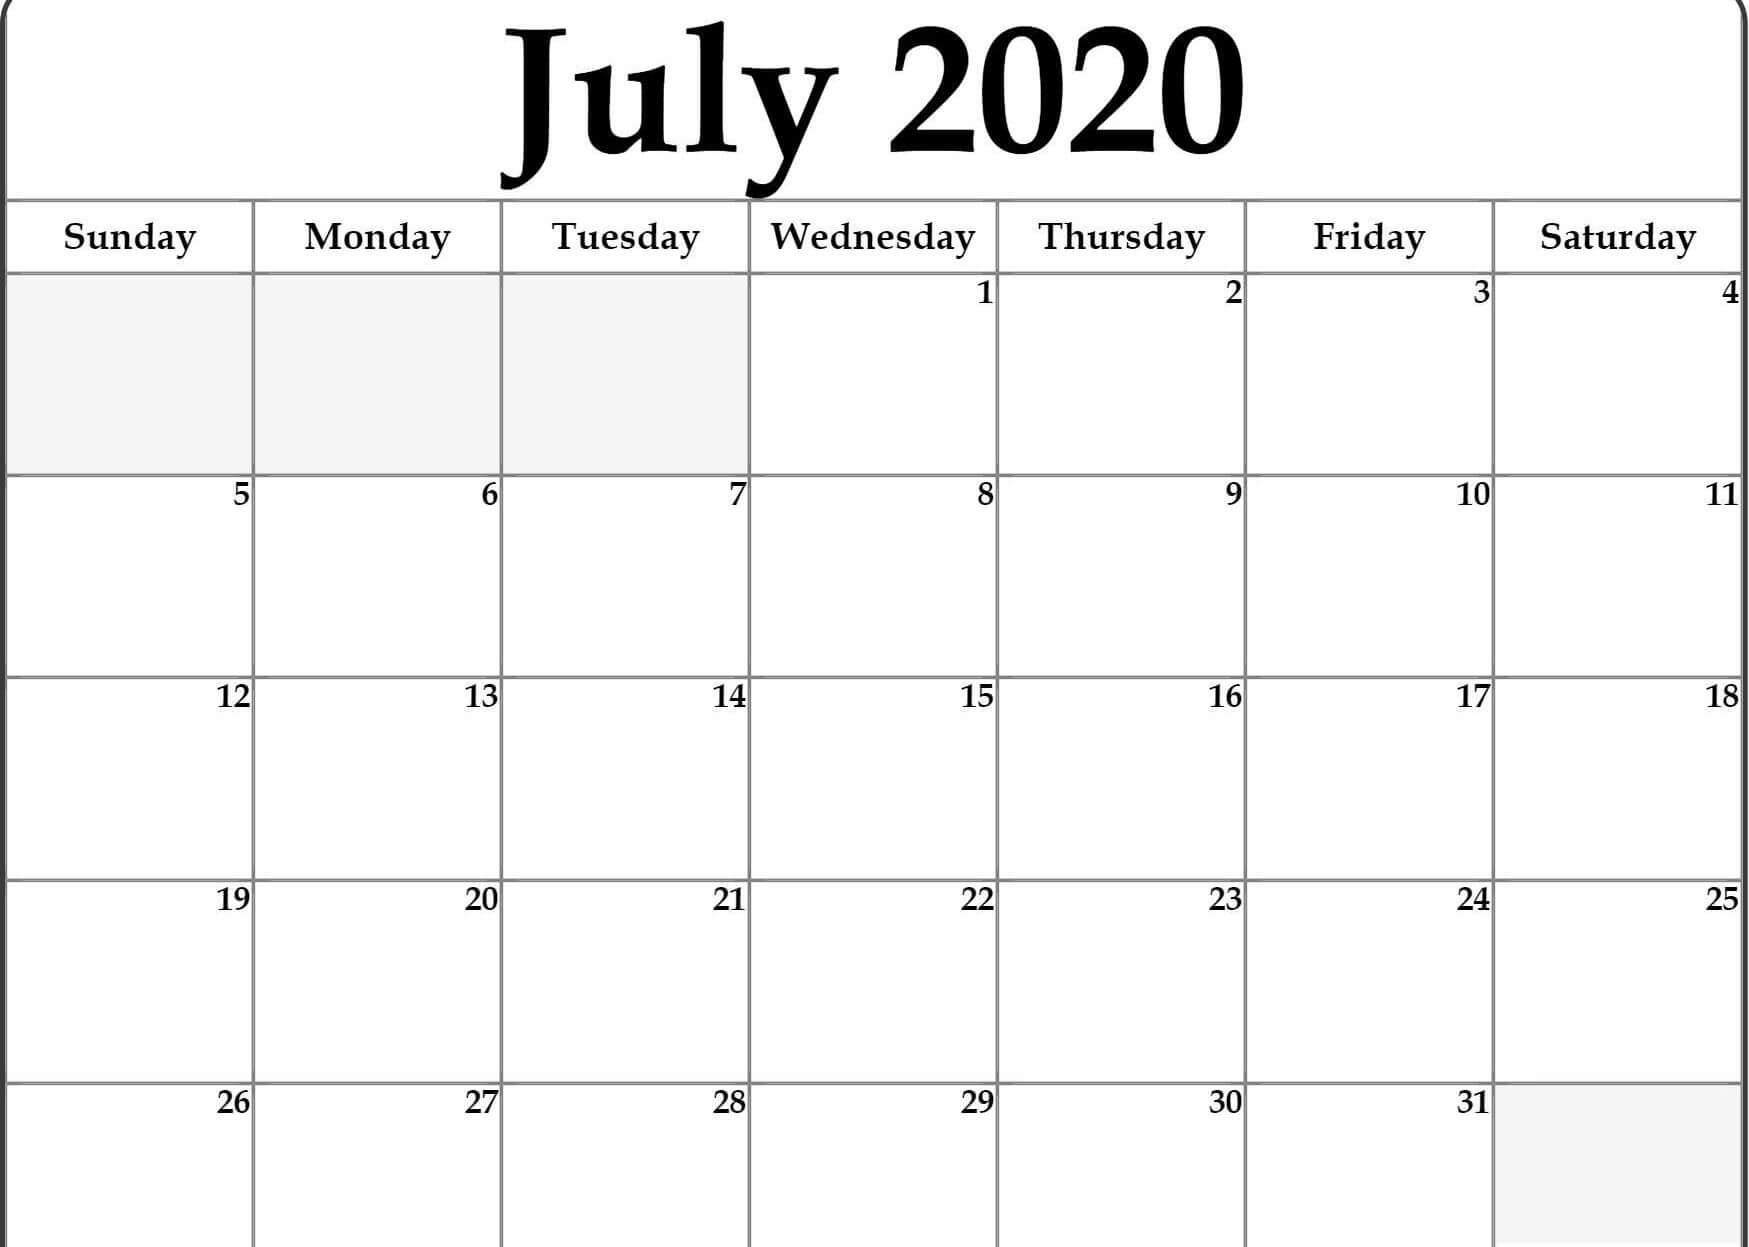 July 2020 Calendar Printable PDF